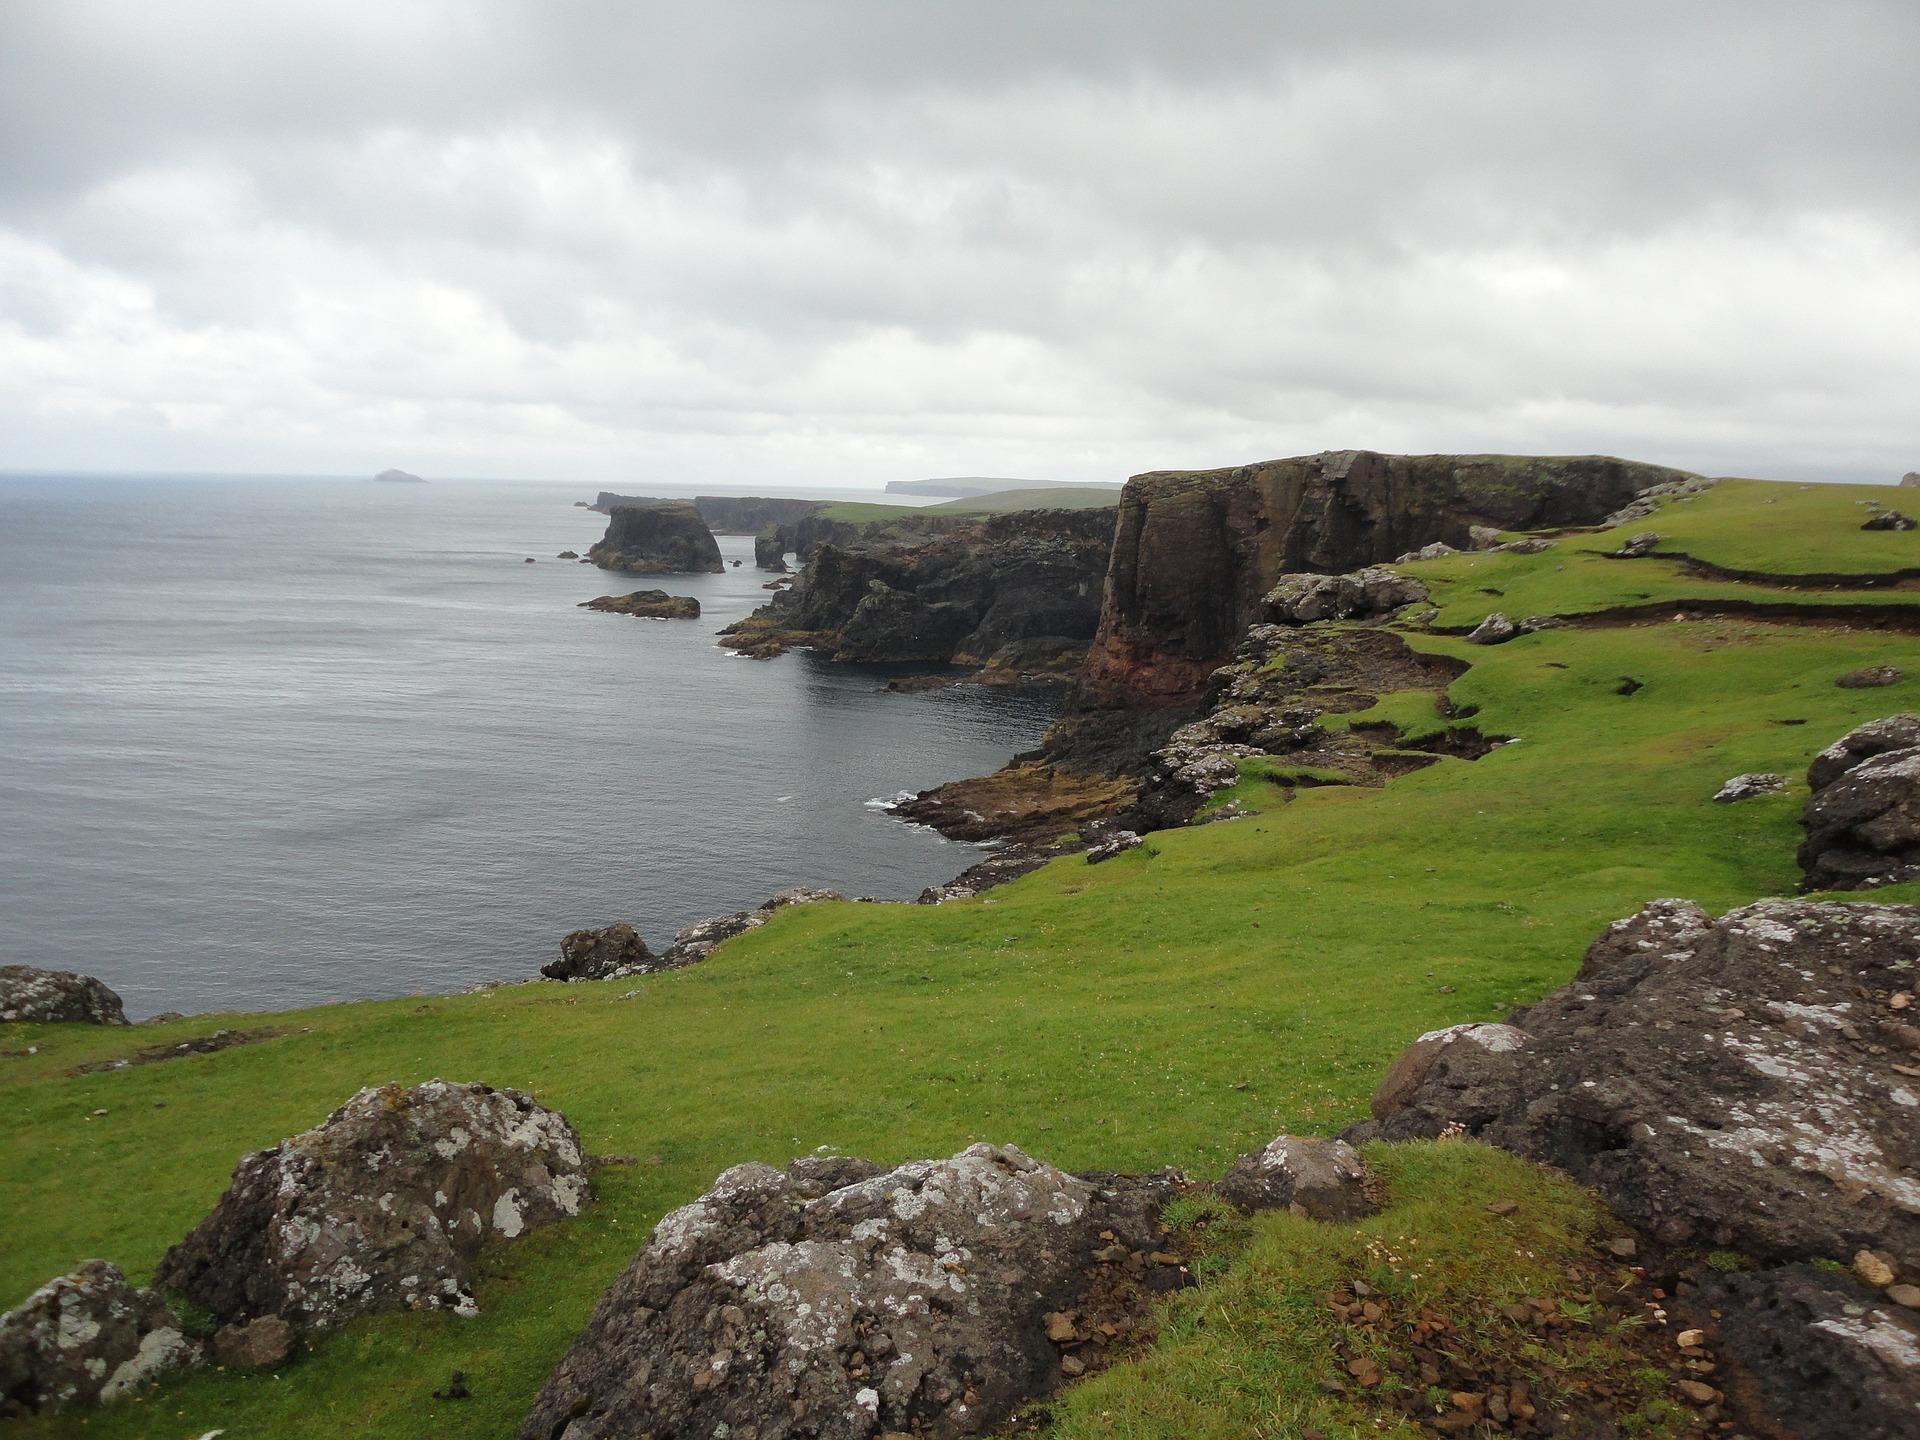 Shetland series books set in the Shetland Islands, Scotland